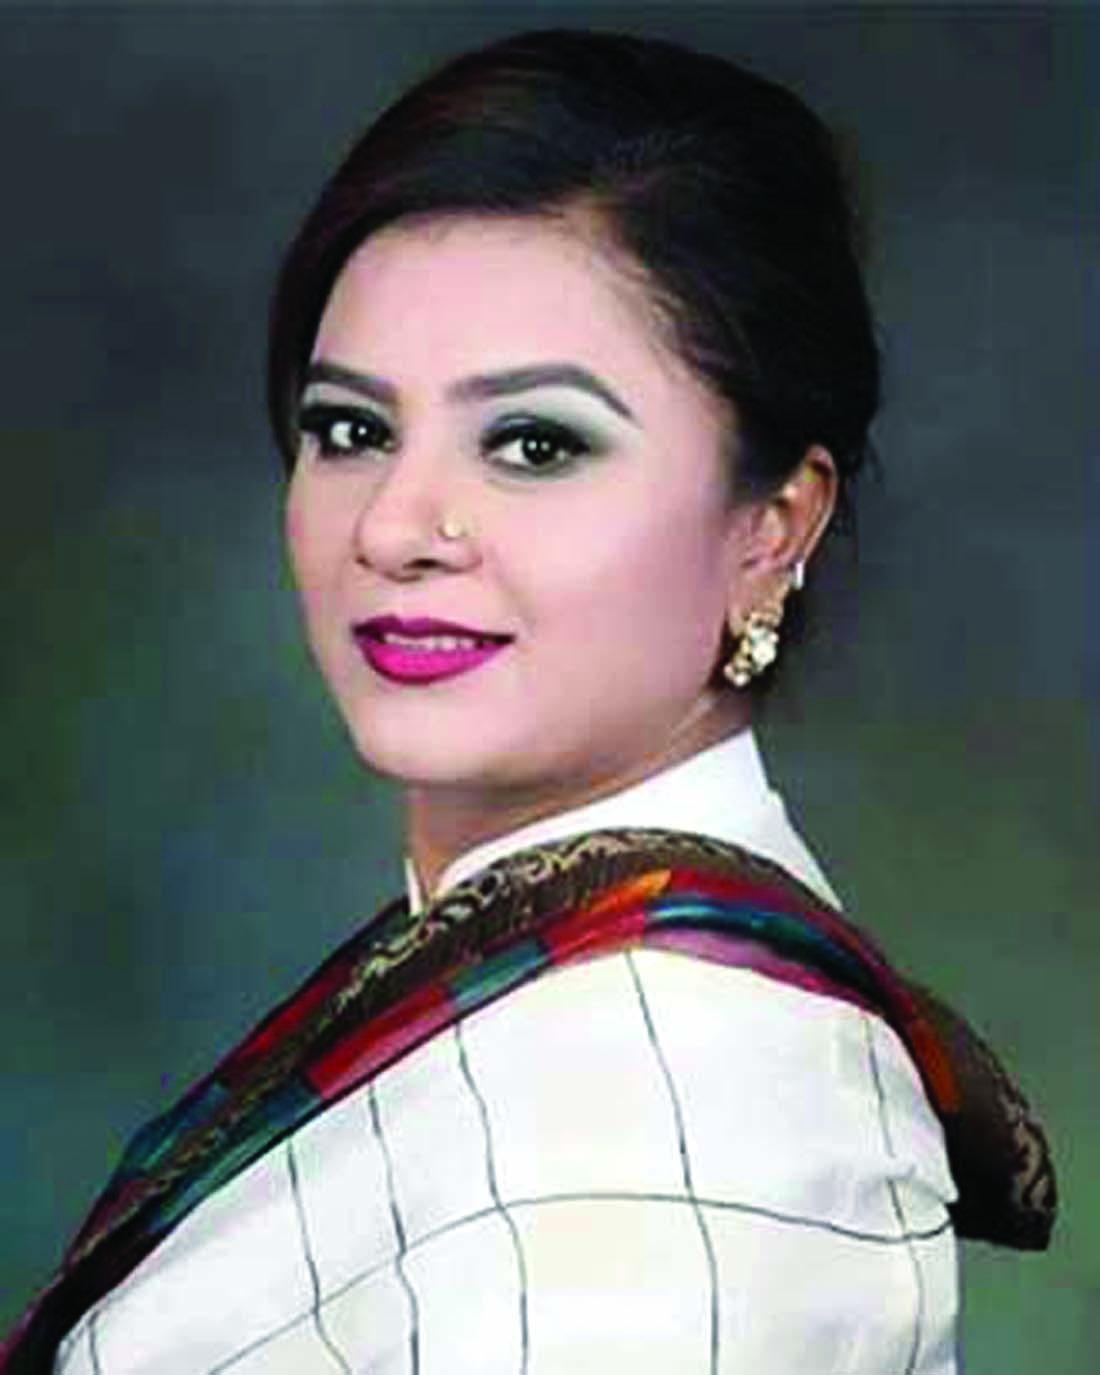 Helena Jahangir's  residence raided